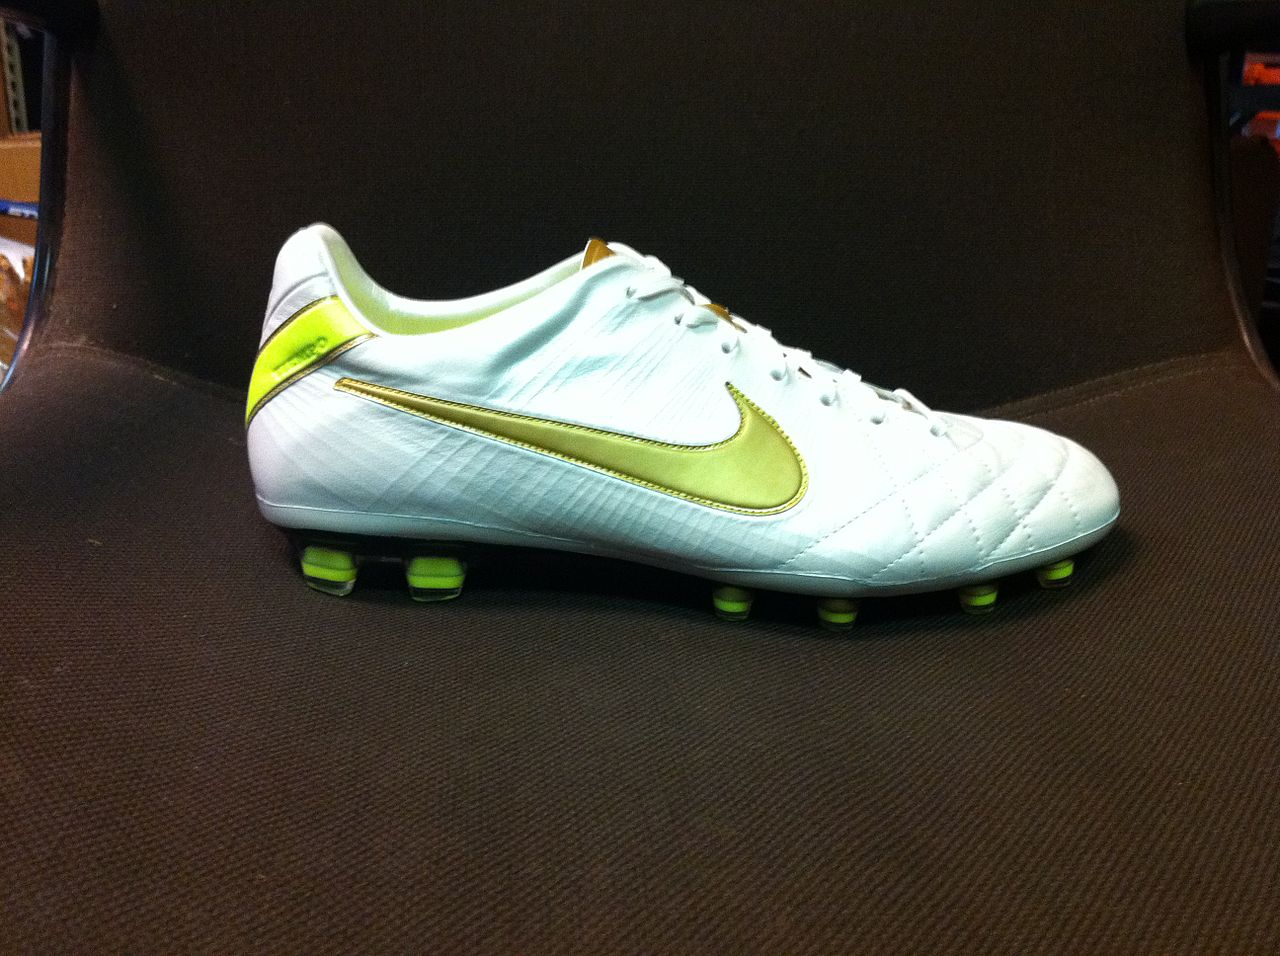 Nike Tiempo Legend V Ag R Turf Soccer Shoes